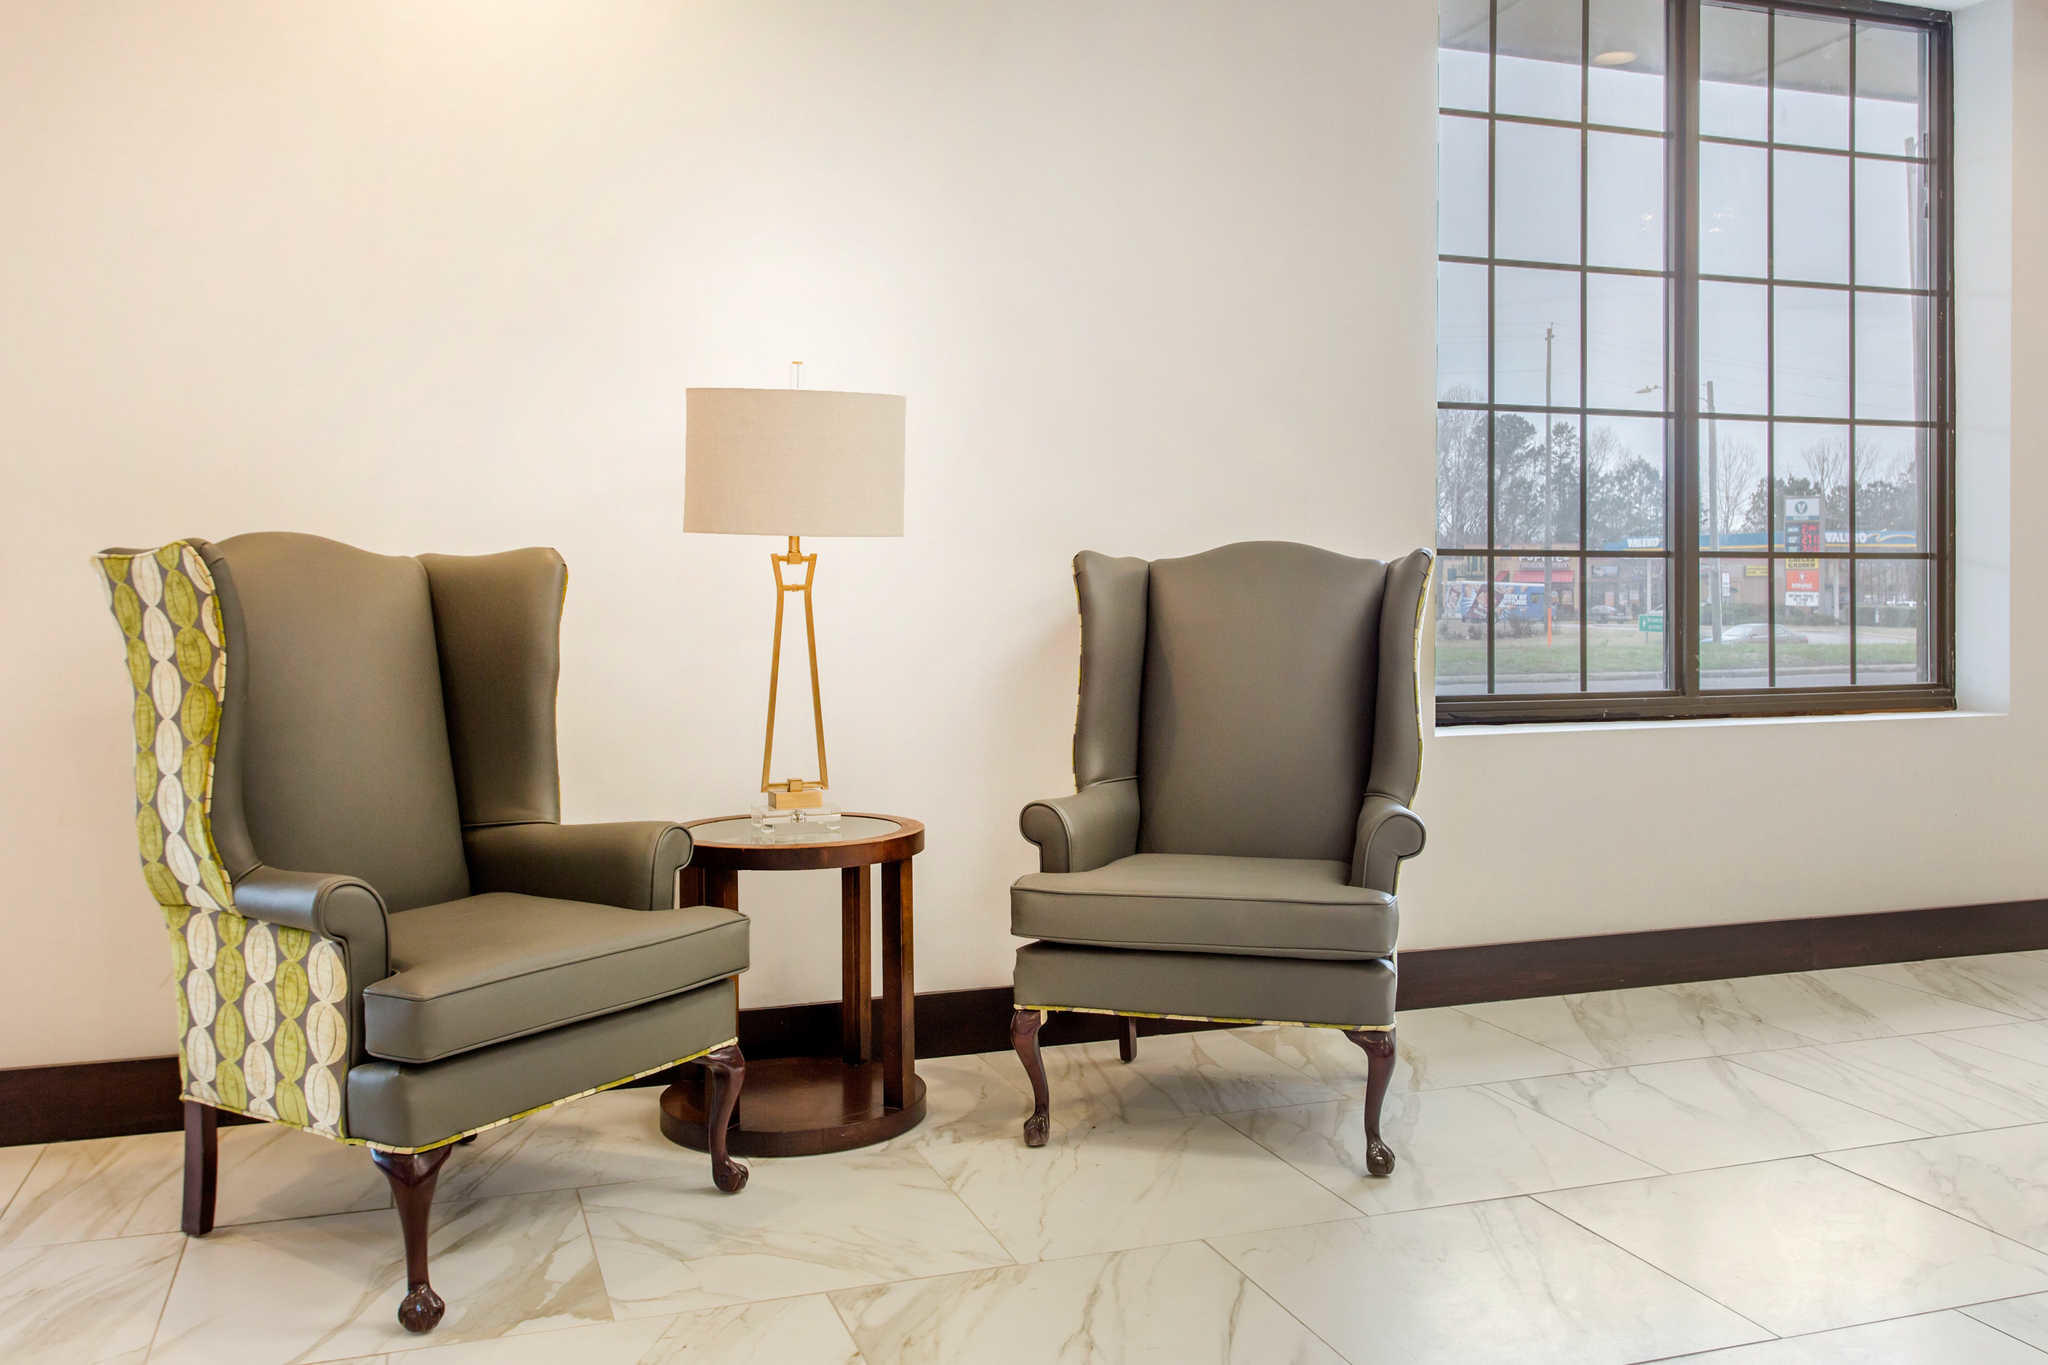 Clarion Inn & Suites image 6